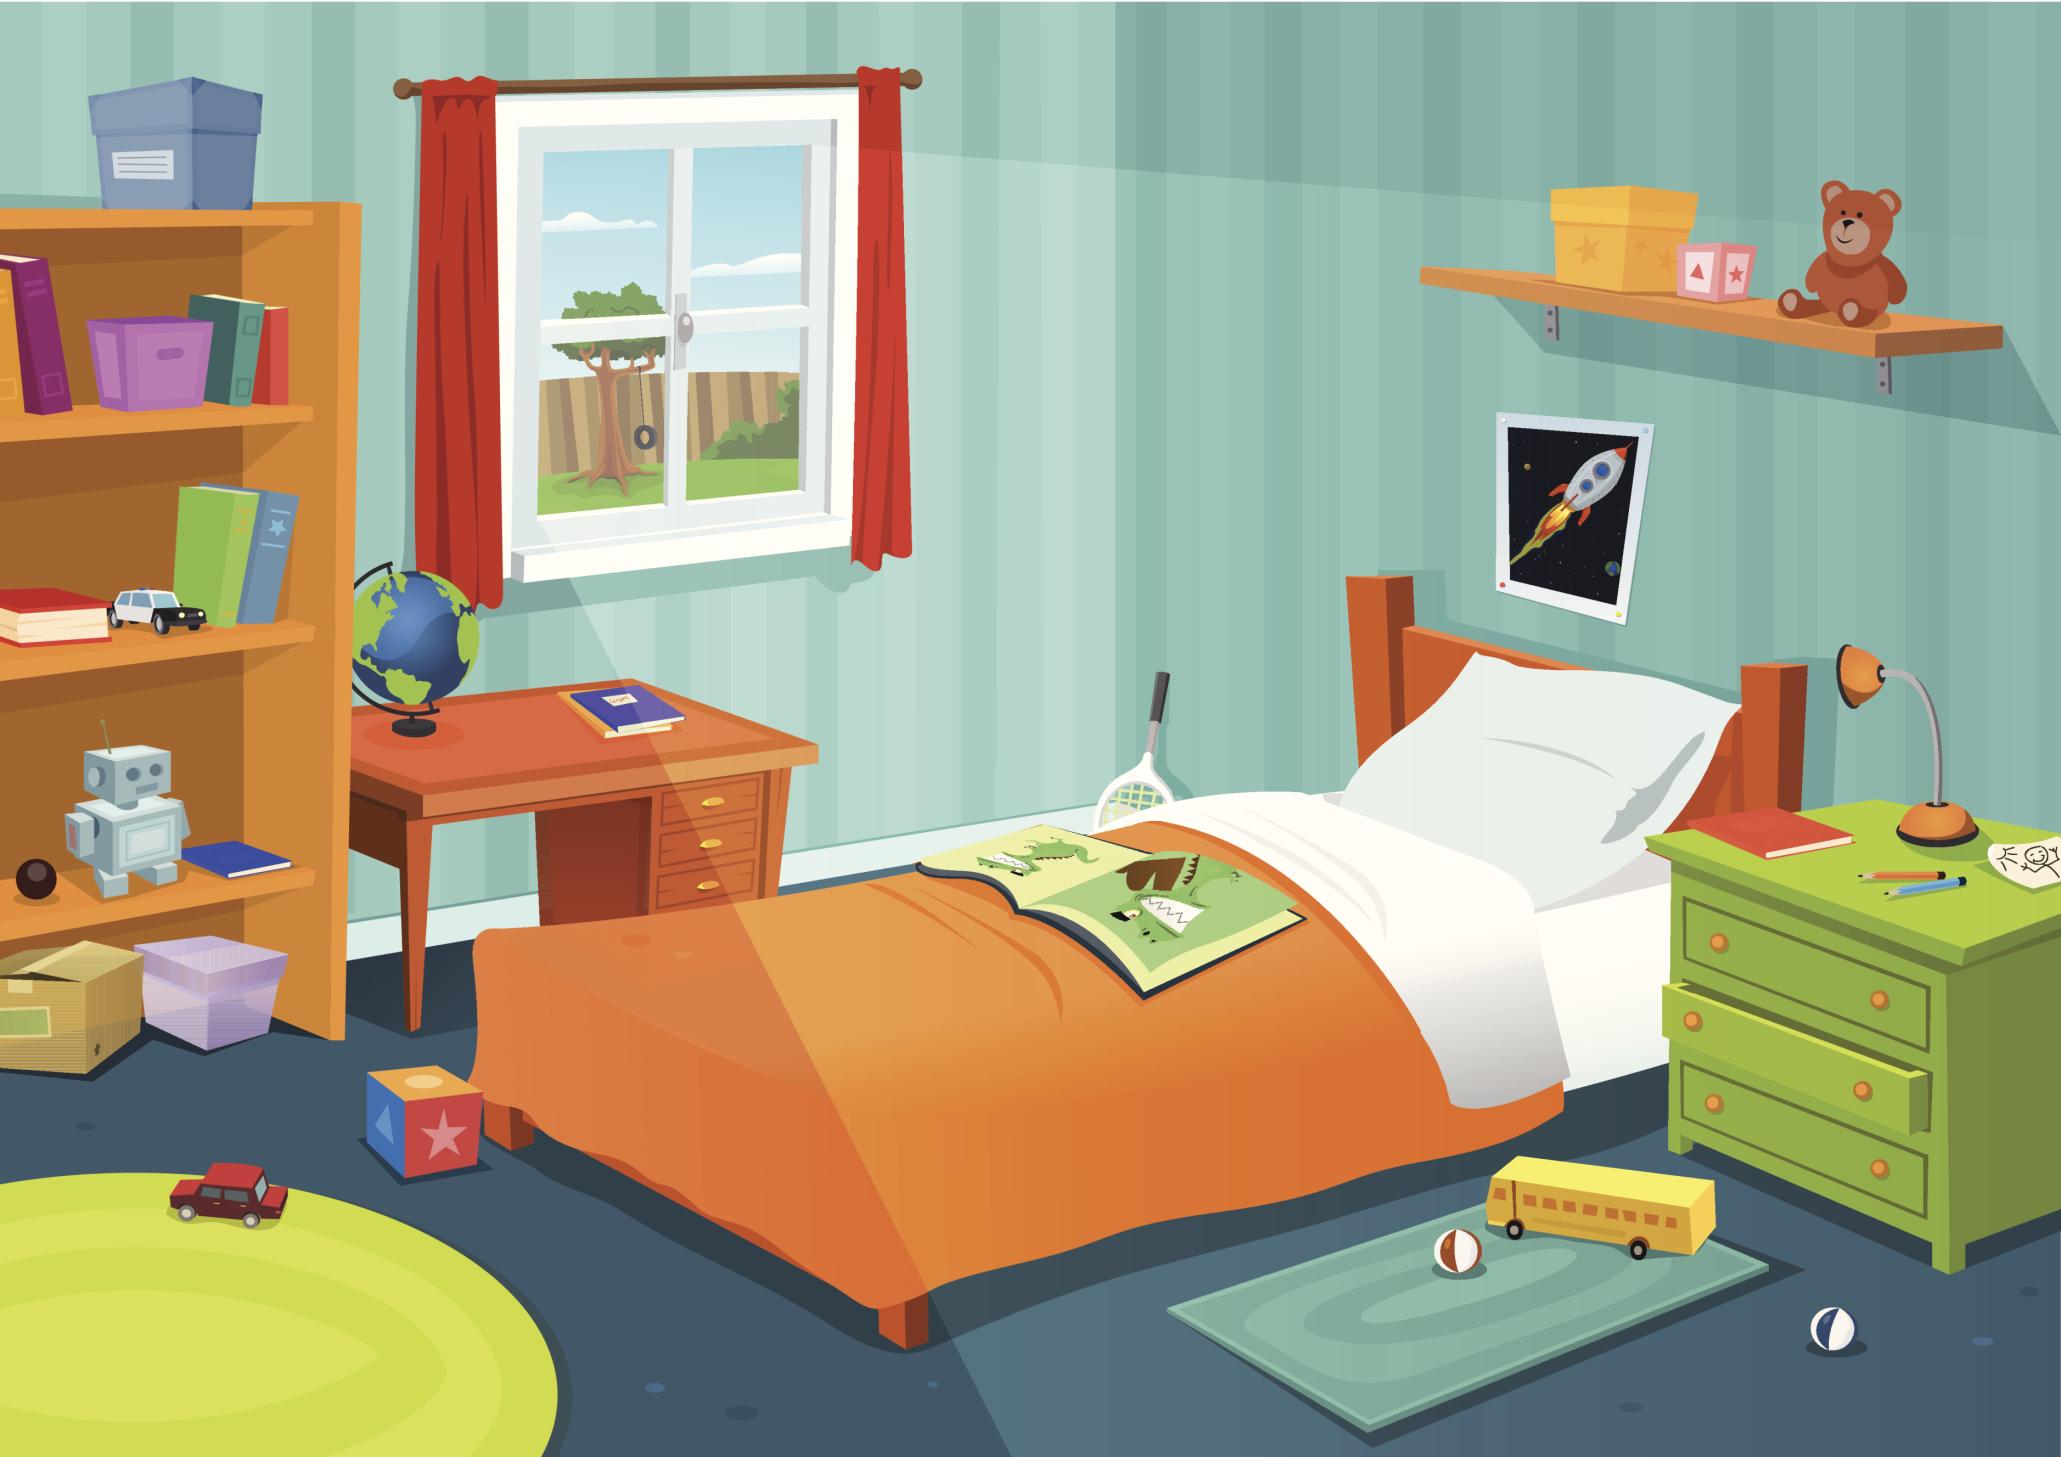 Bedroom drawing for kids - Bedroom Drawing For Kids Bedroom Drawing For Kids Kids Bedroom Drawing